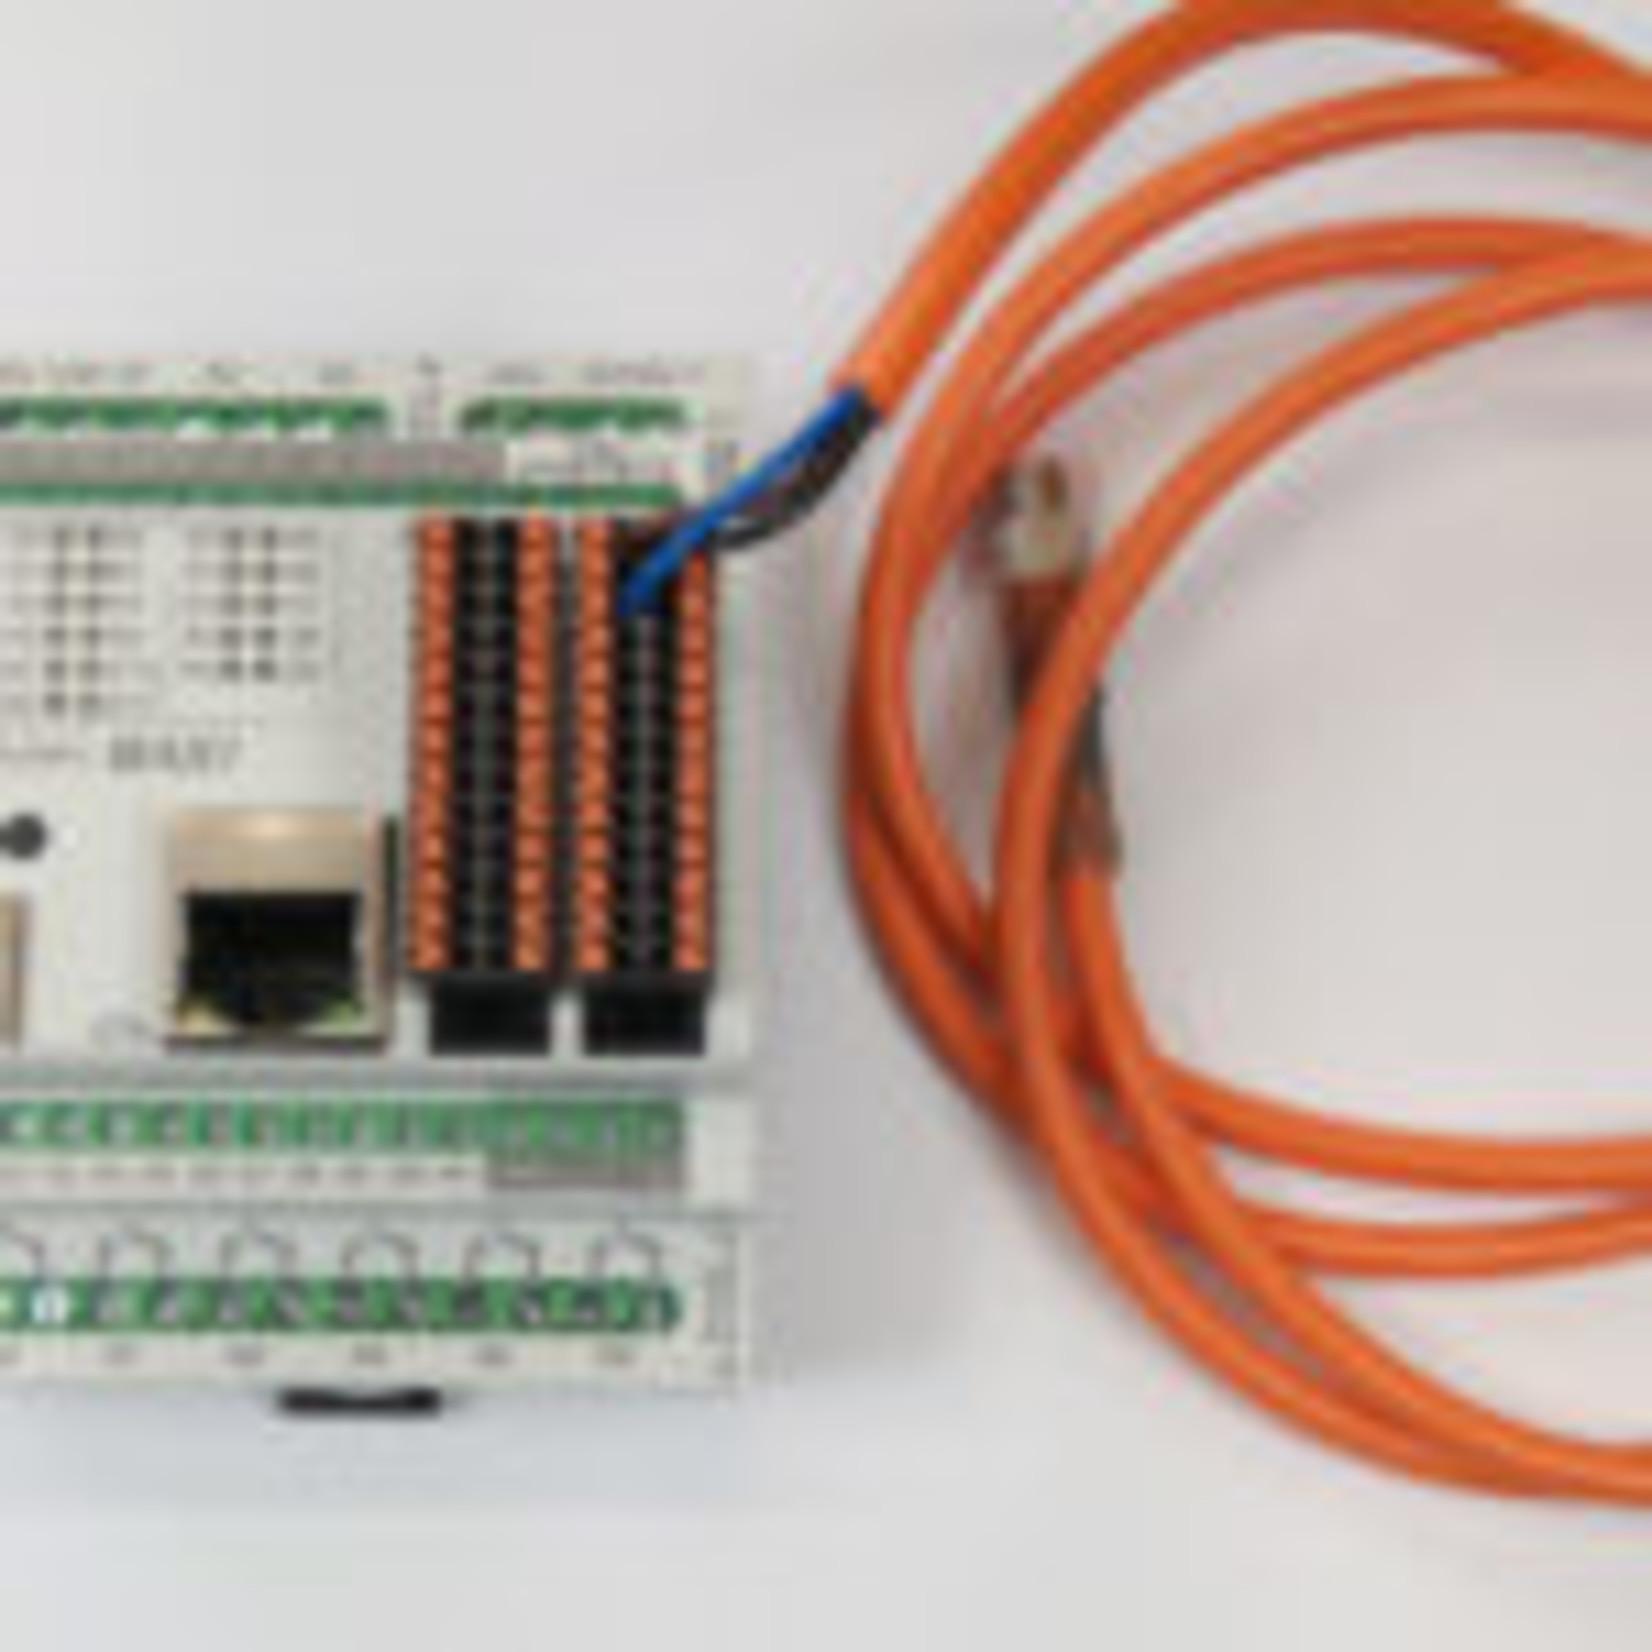 Controllino CONTROLLINO  Screwless Terminal Block Plug (26 Position)